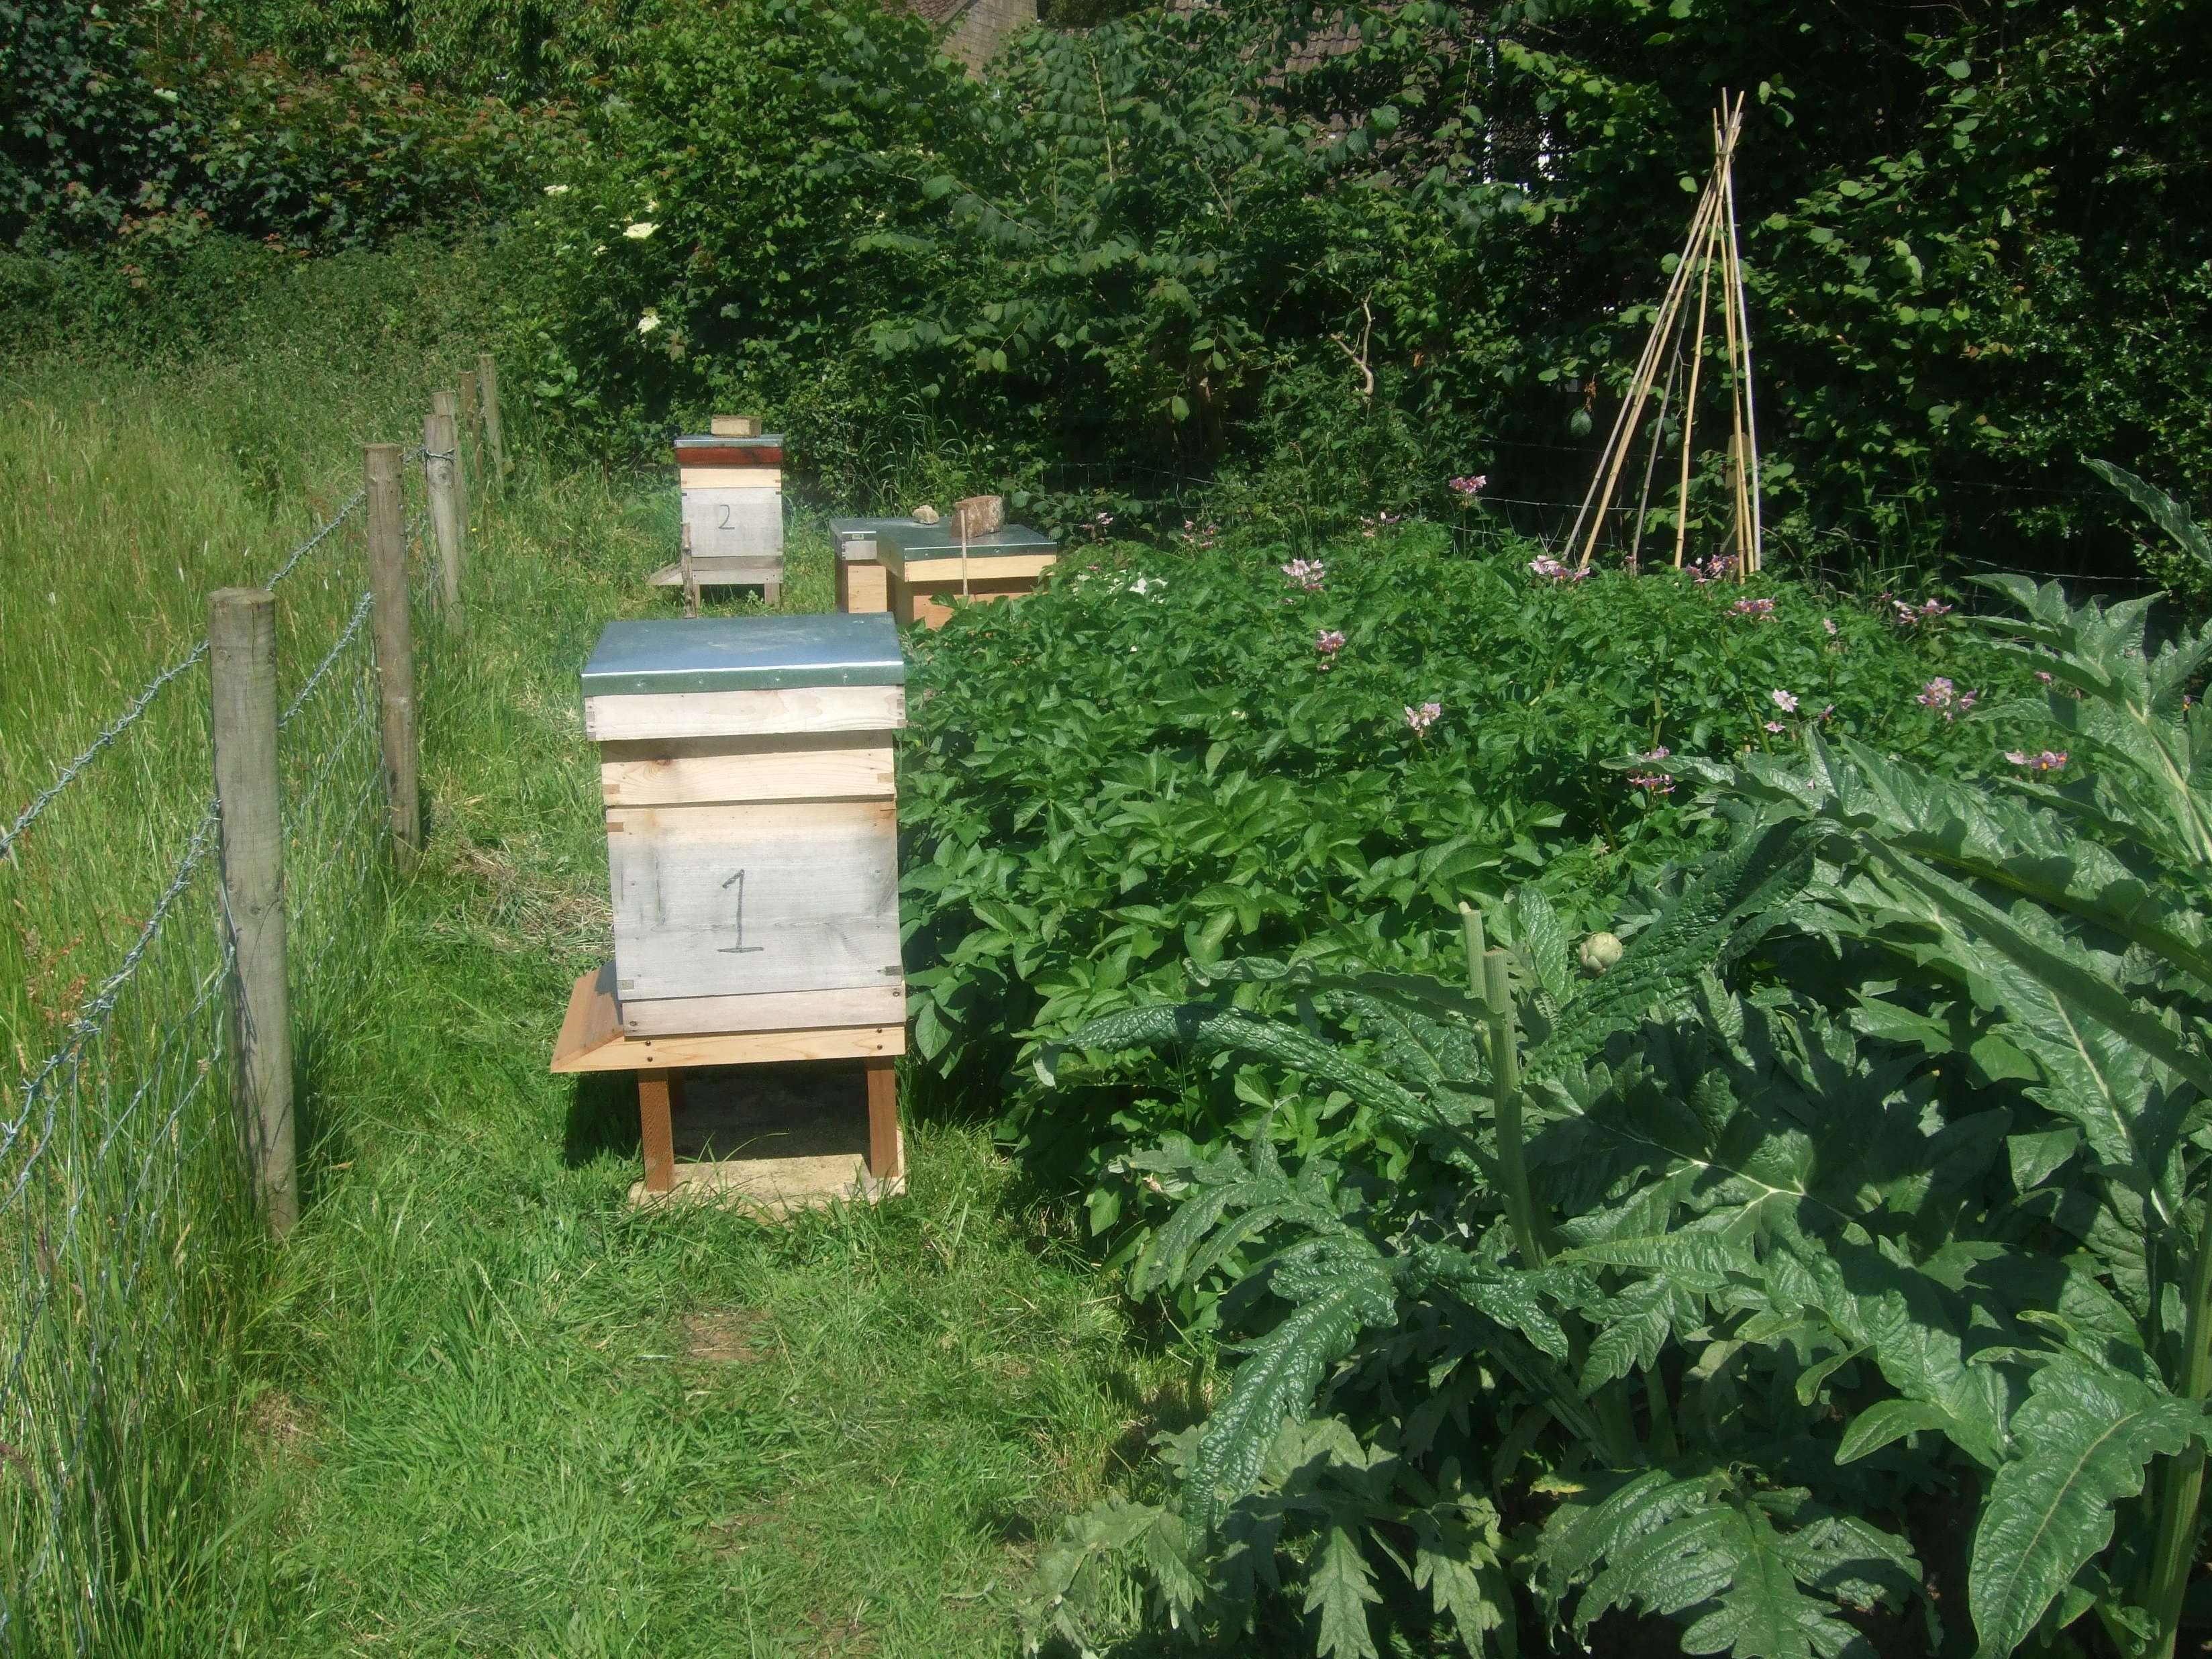 Beehive, Potatoes, Globe Artichoke